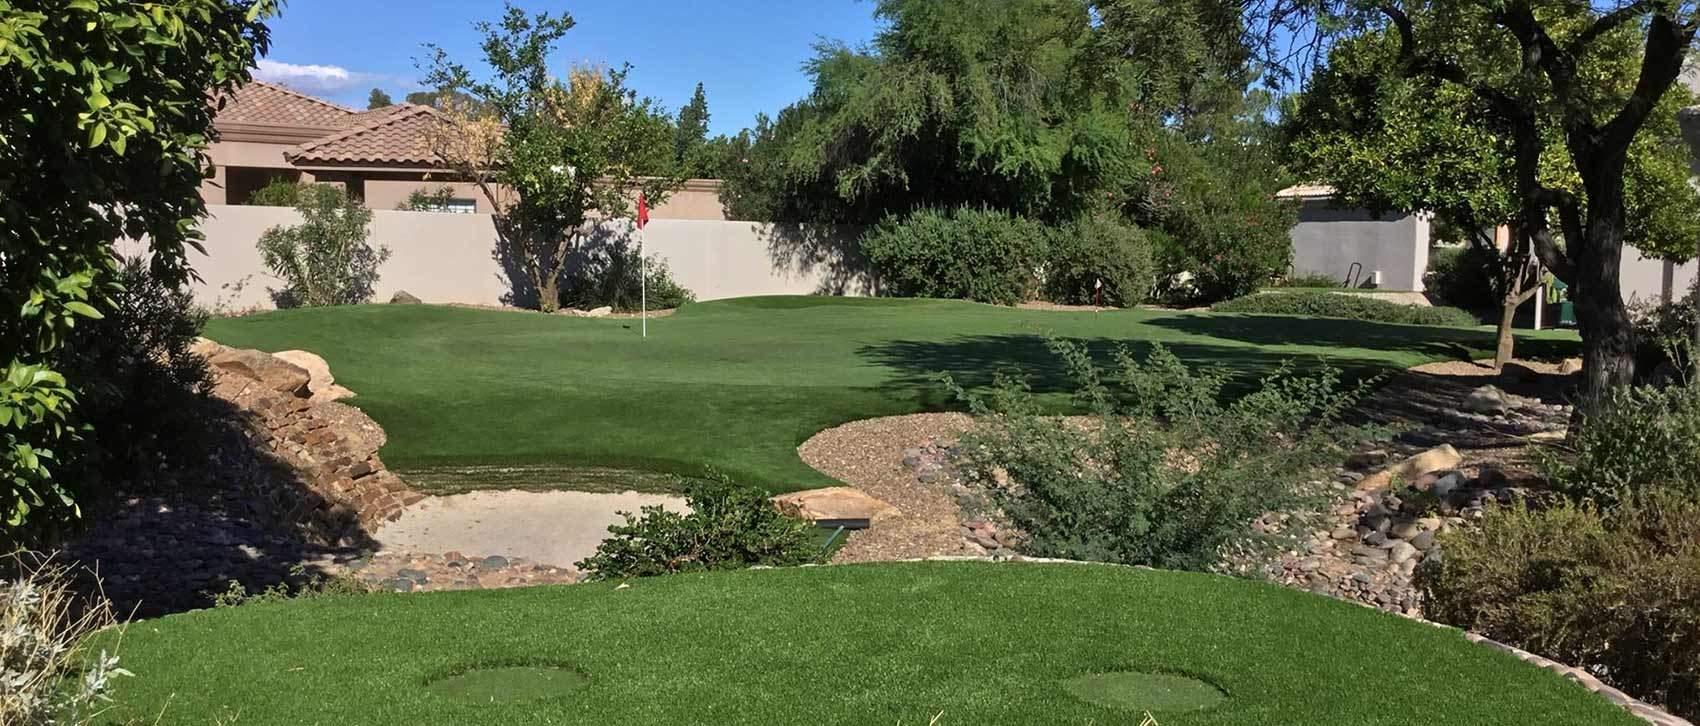 backyard golf green with undulations